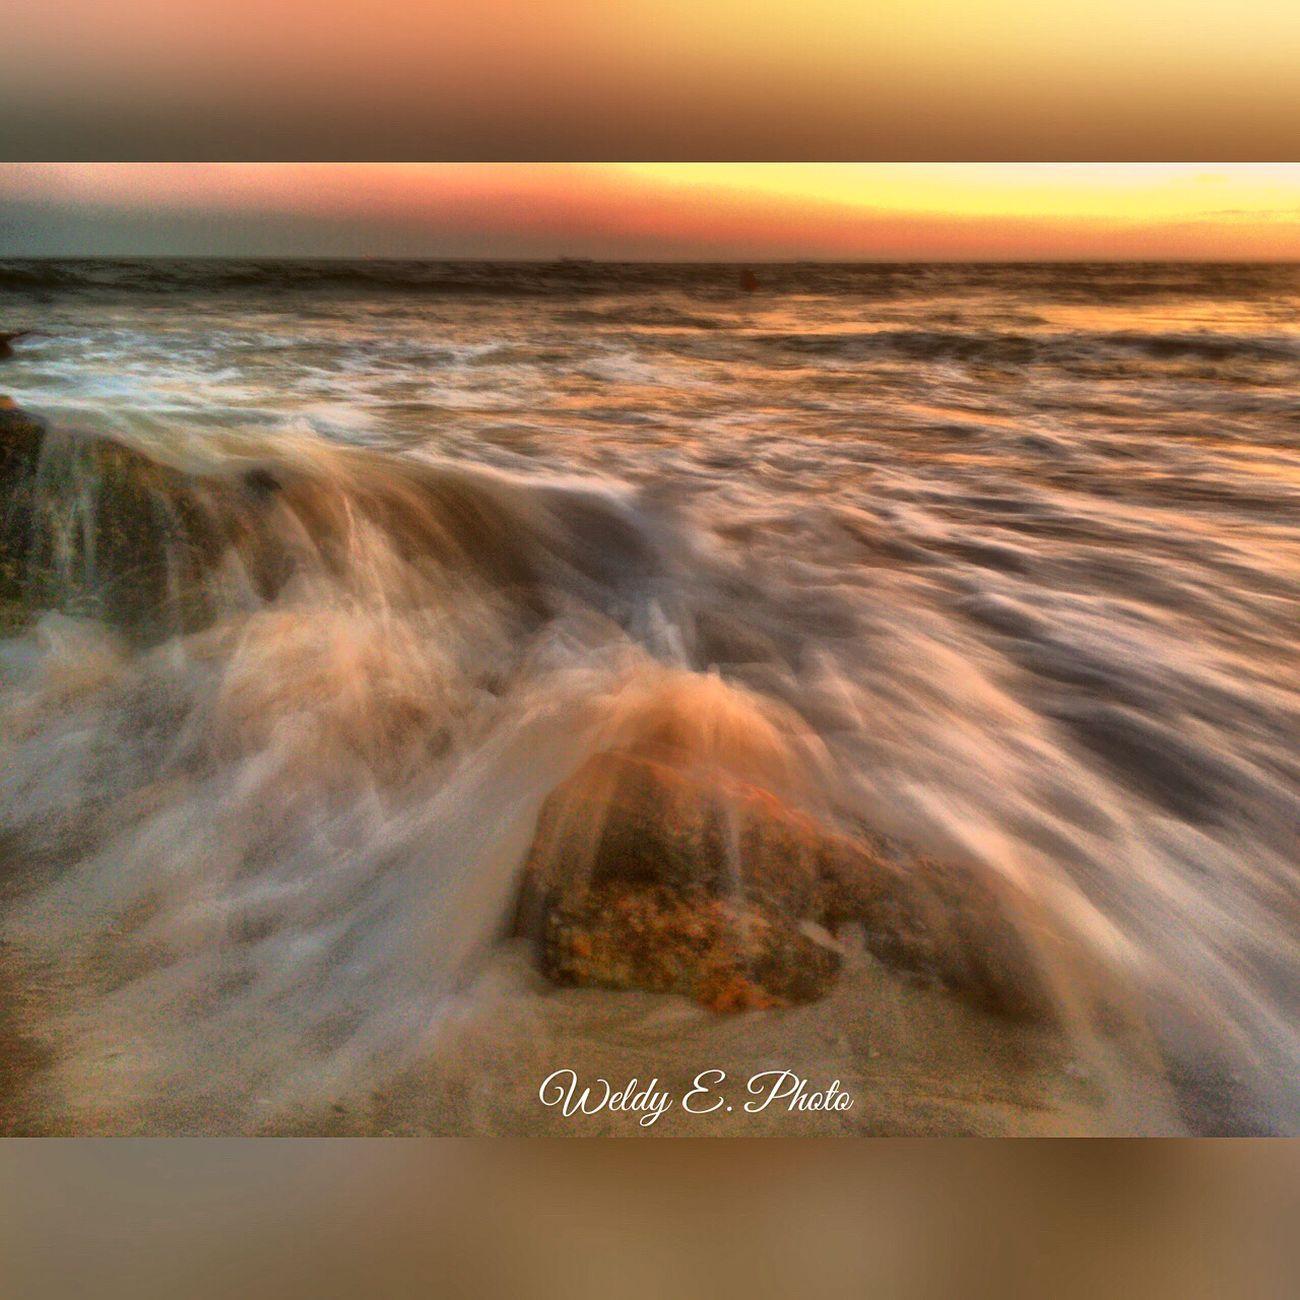 Sunset At Long Beach, NY Longexposurephotography Long Exposure Shot Beachphotography Visualmagic EyeEm Best Shots - Long Exposure Sunset_collection Slowshutter World EyeEm Sunset Popular Photos